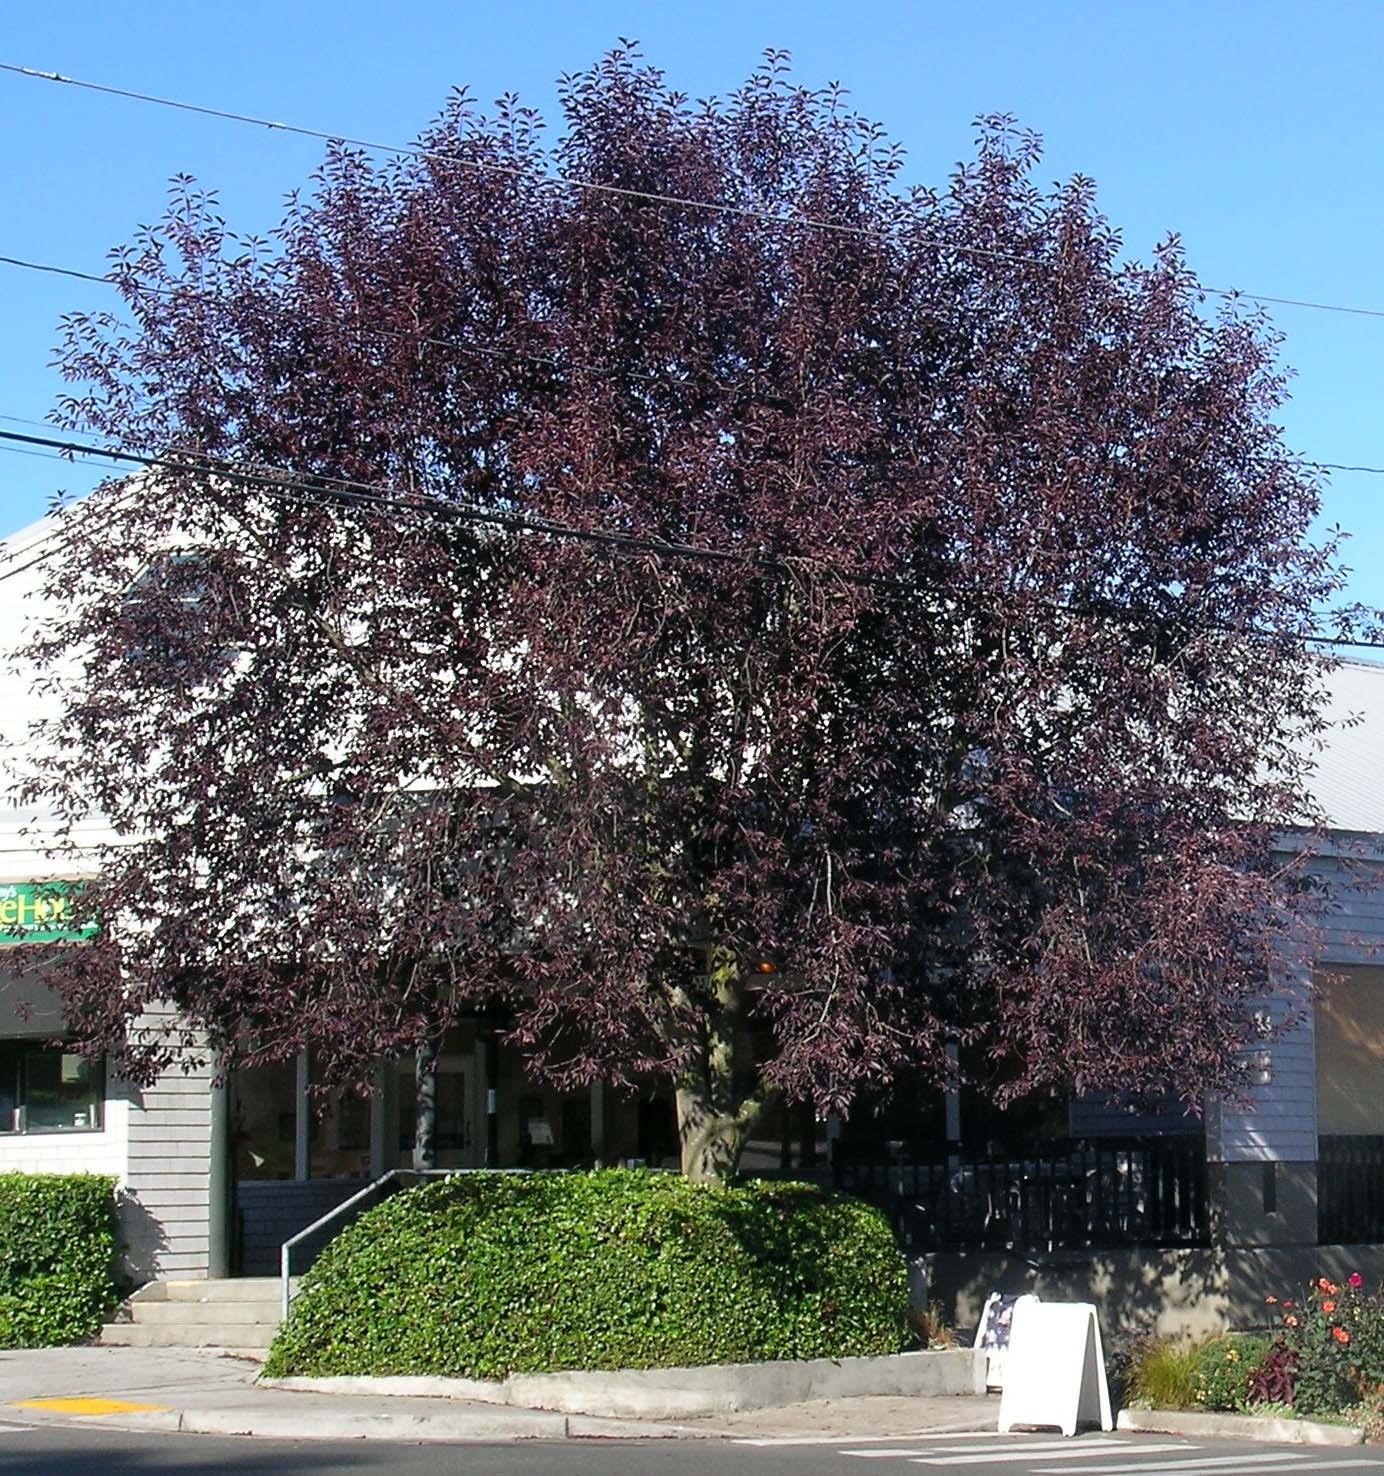 Canada Red Chokecherry Ornamental Cherry Trees